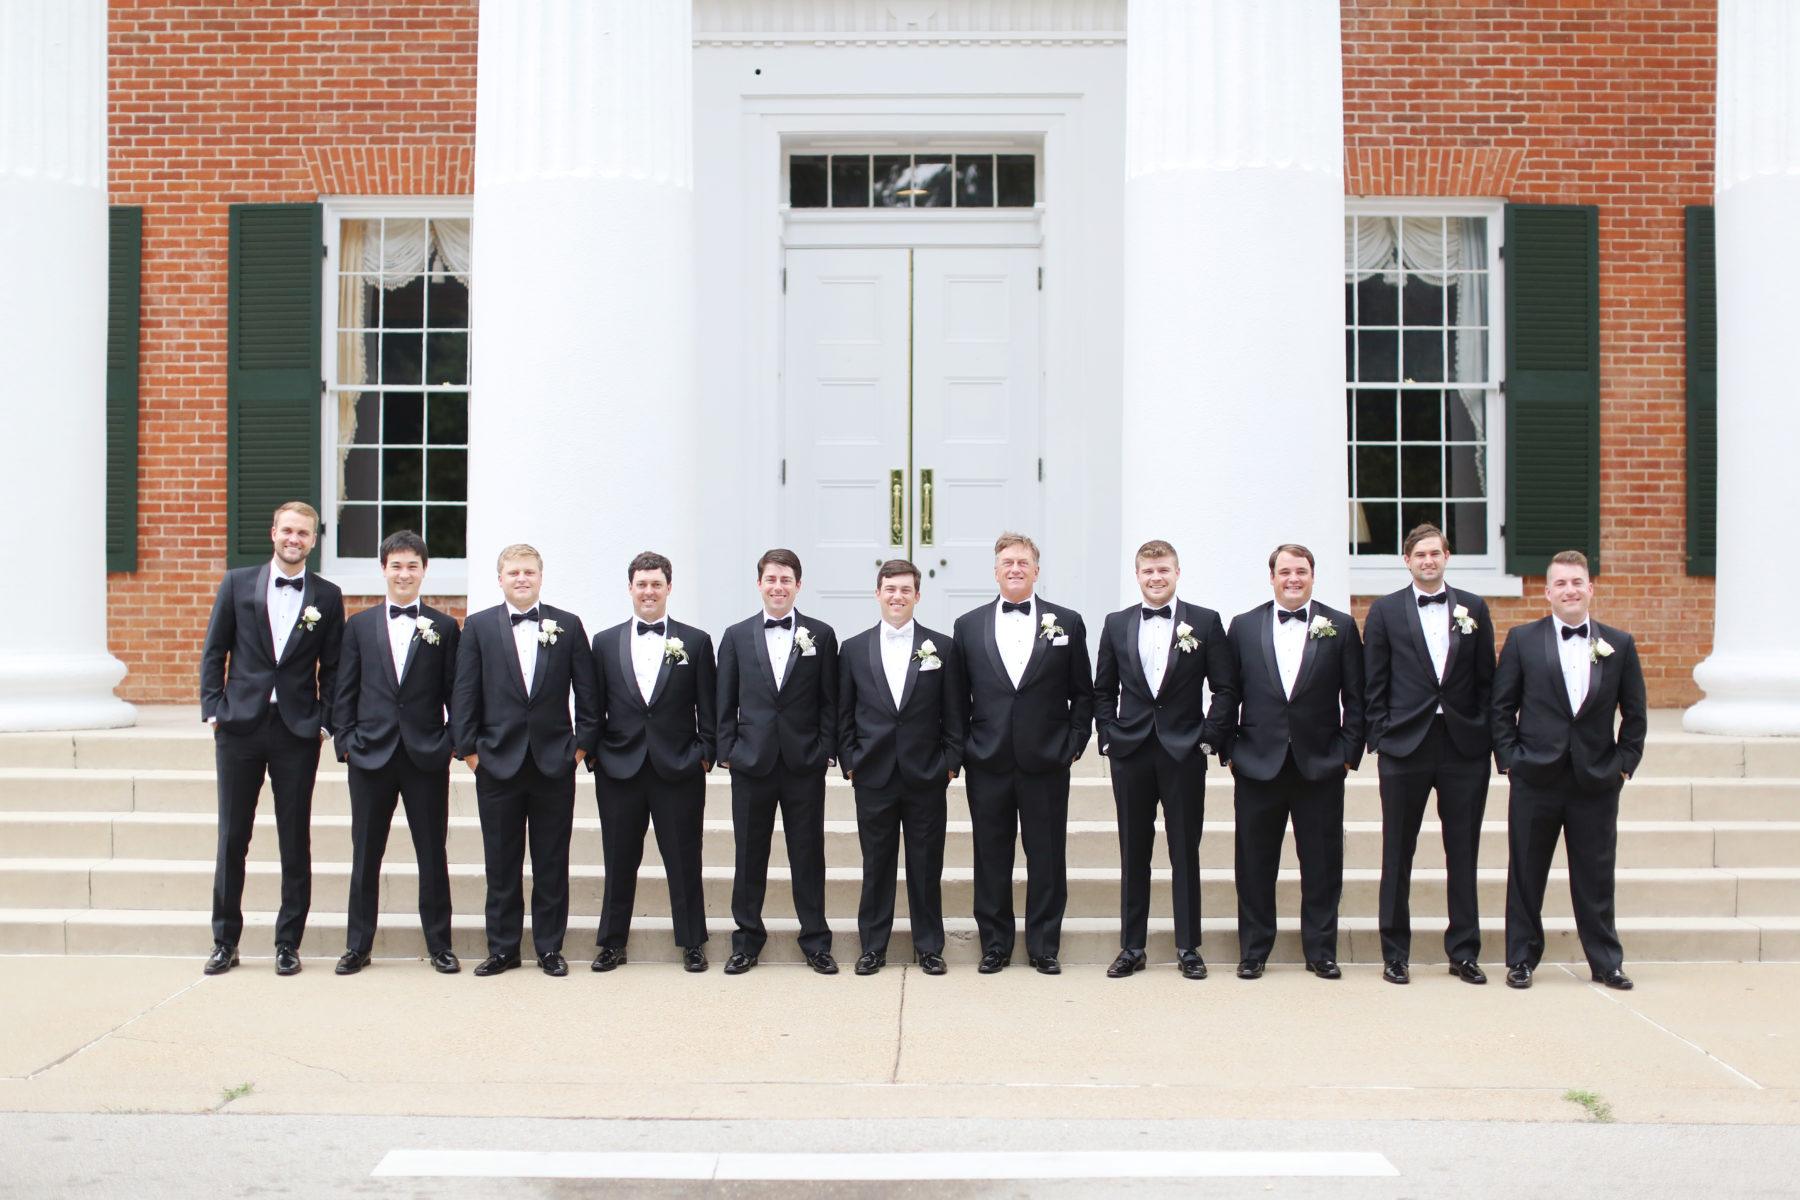 Black and White Wedding Tuxedo: Eliza Kennard Wedding Photography featured on Nashville Bride Guide